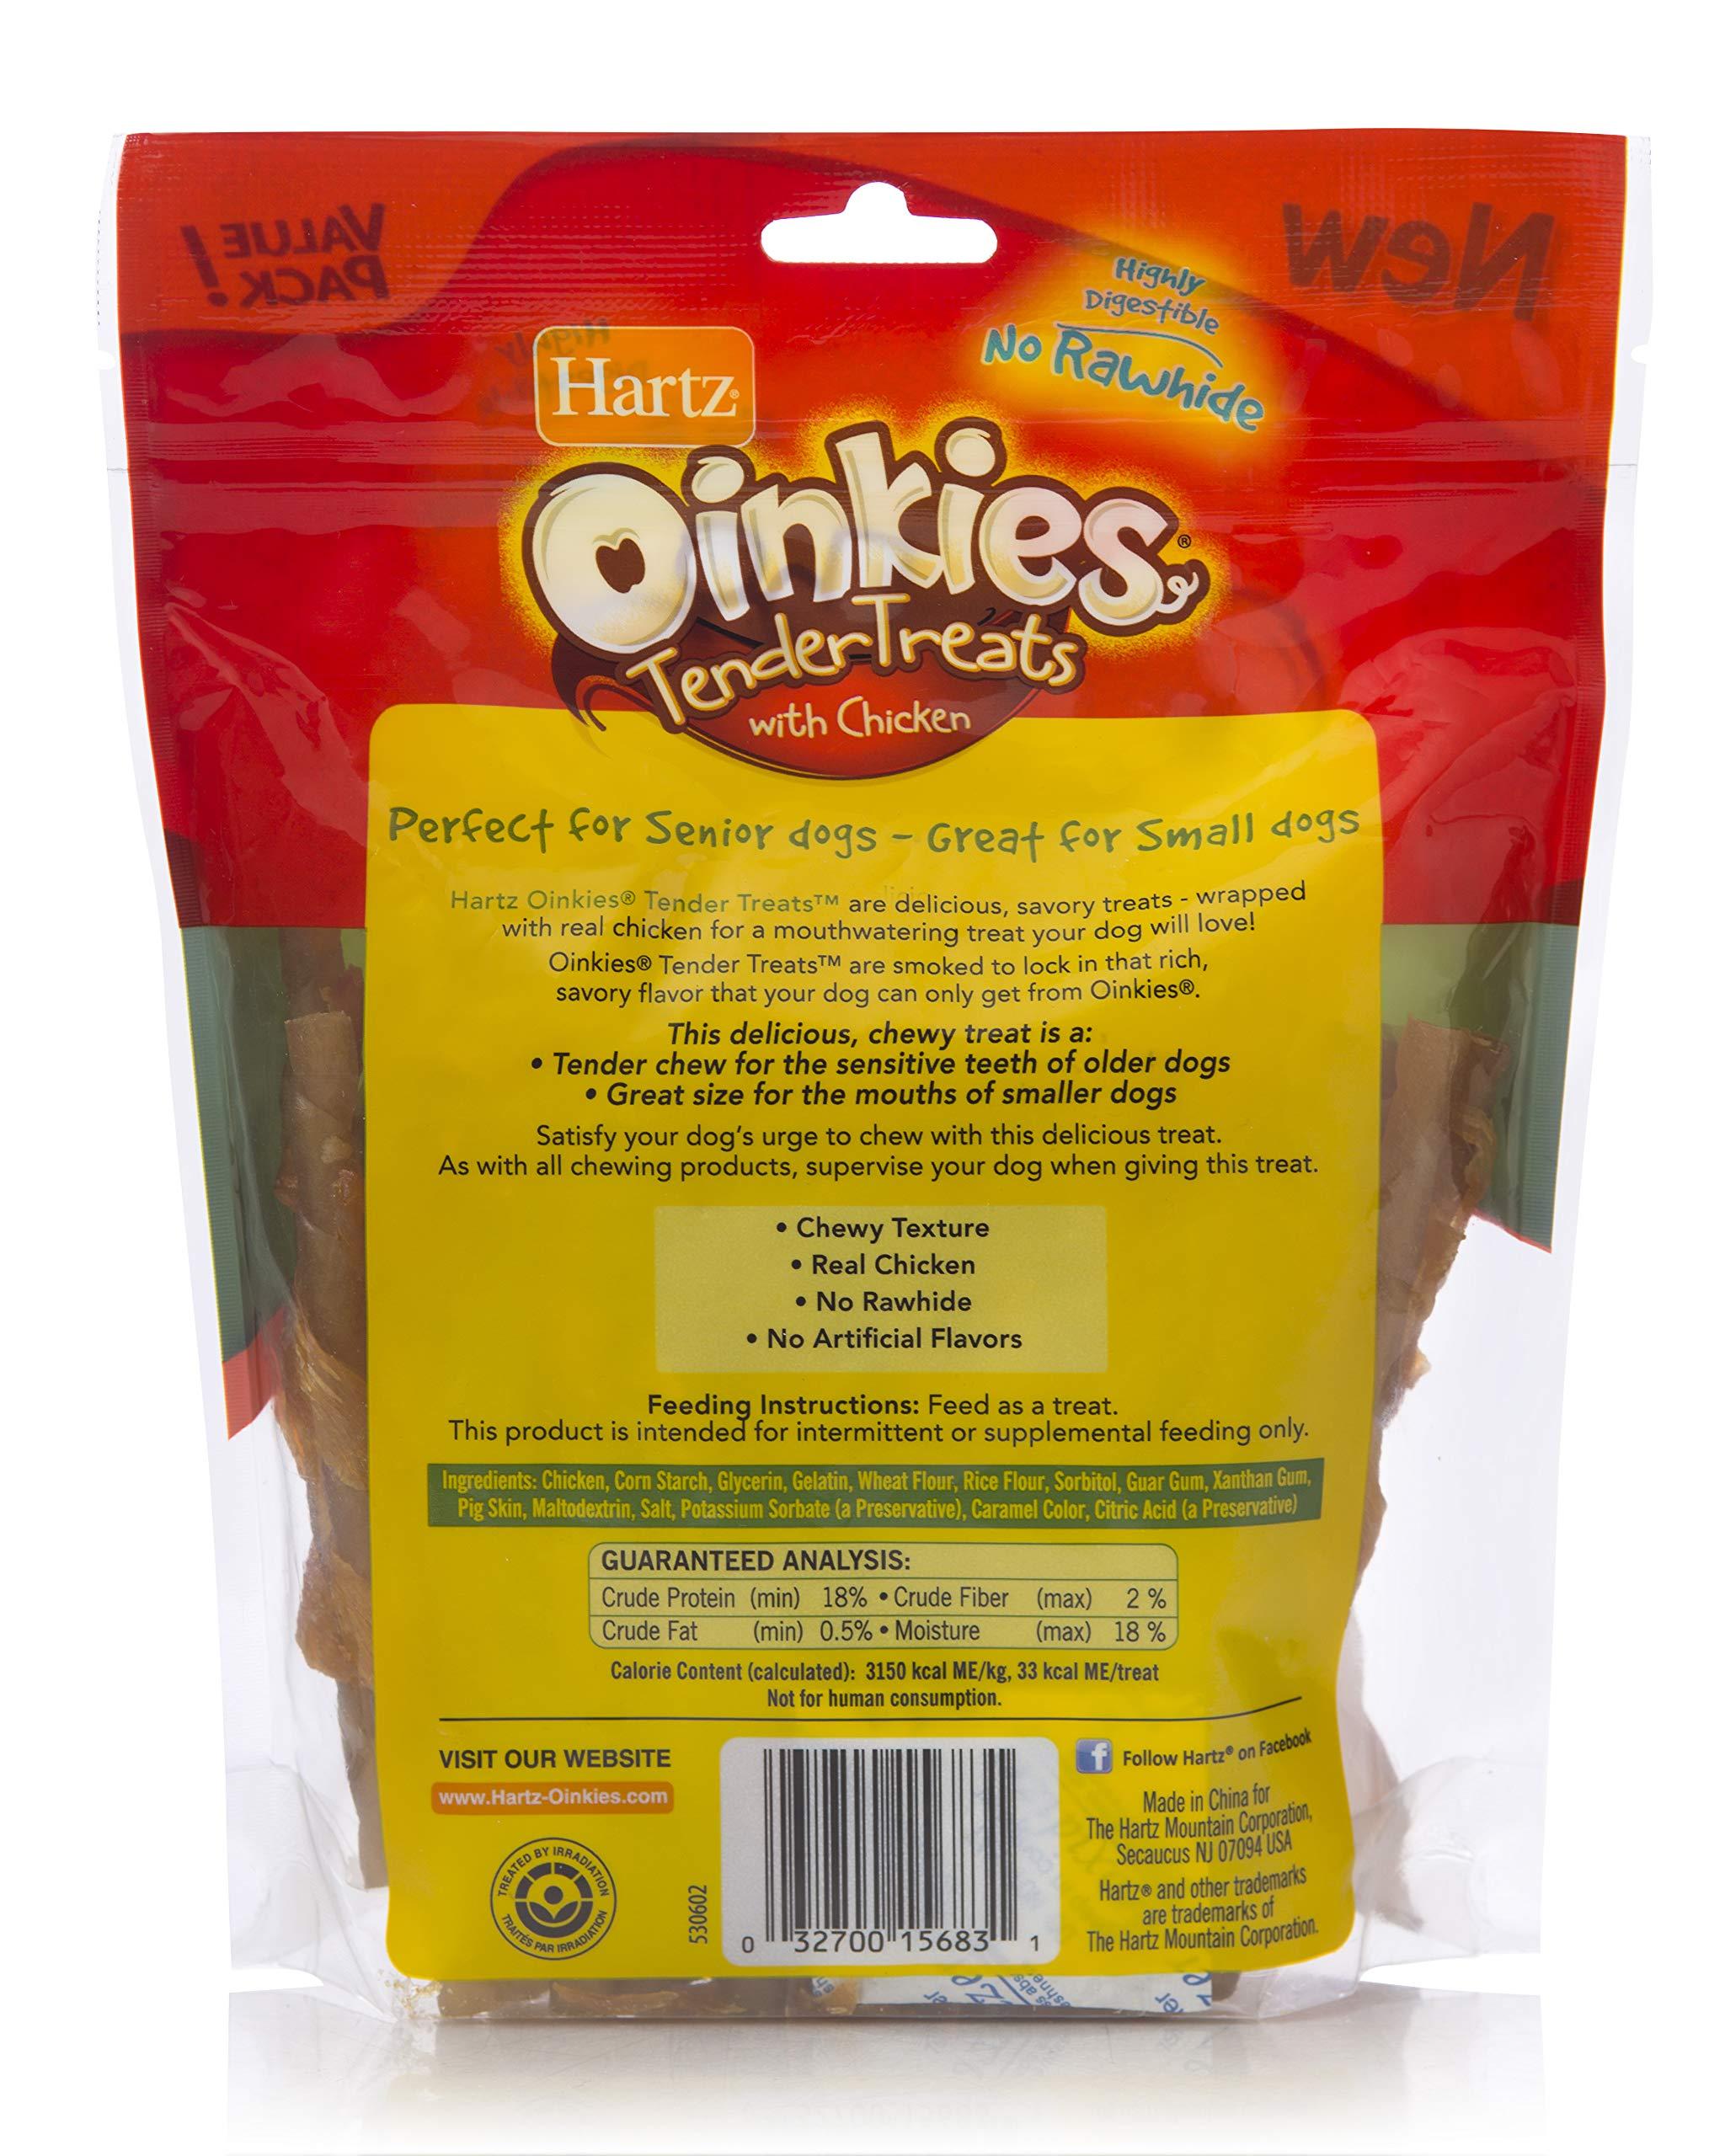 Hartz Oinkies Tender Treats Natural Smoked Chicken Twist Dog Treat Chews - 36 Pack by Hartz (Image #2)